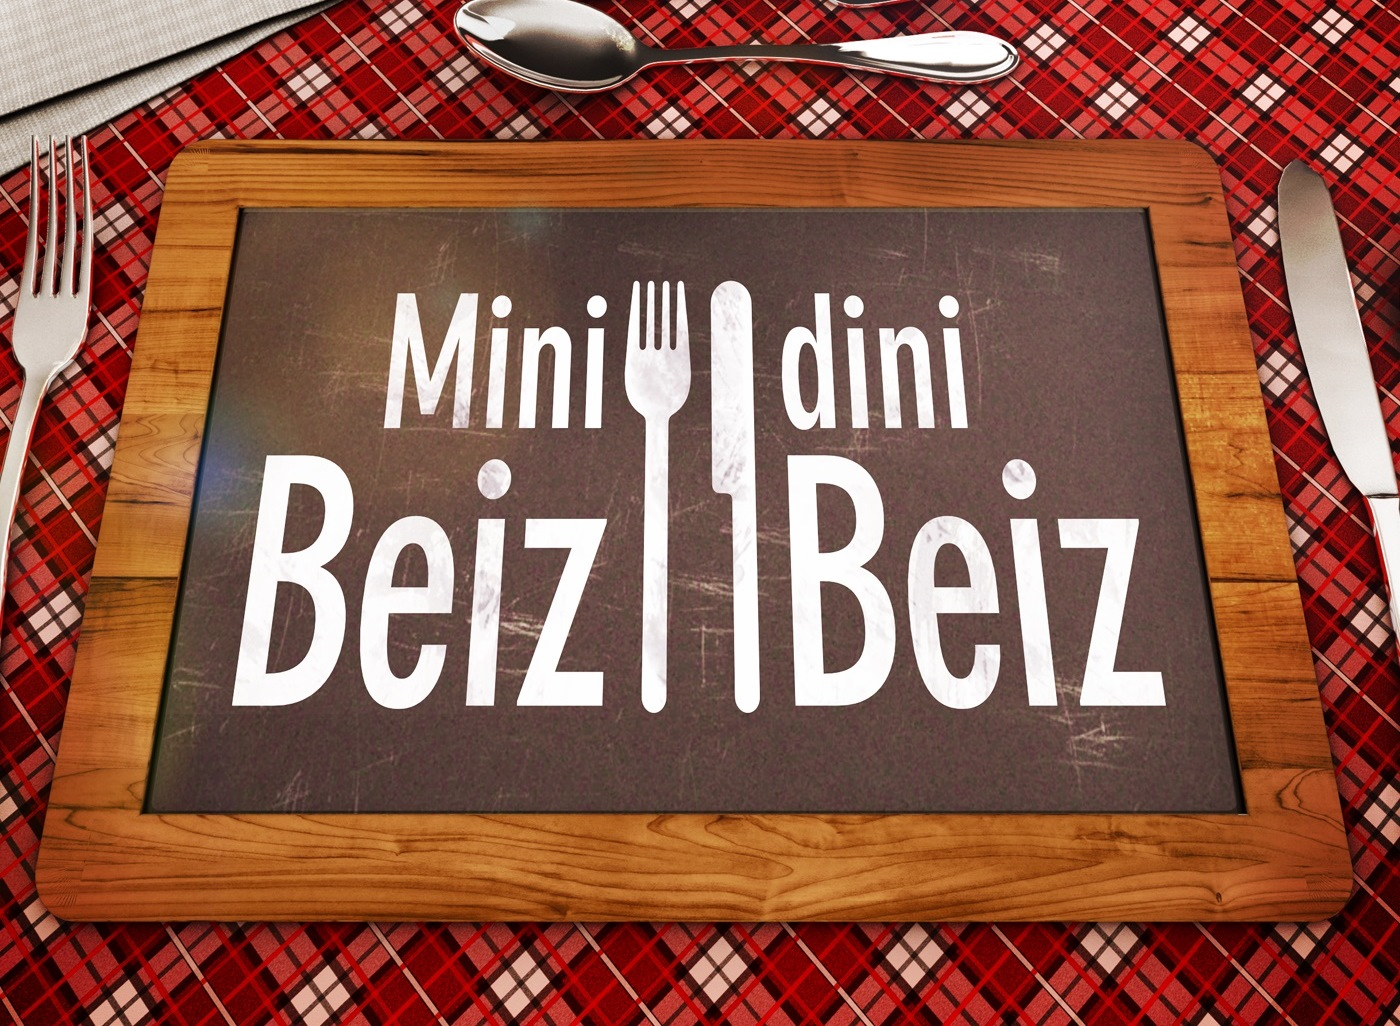 Mini_Beiz_dini_Beiz_011